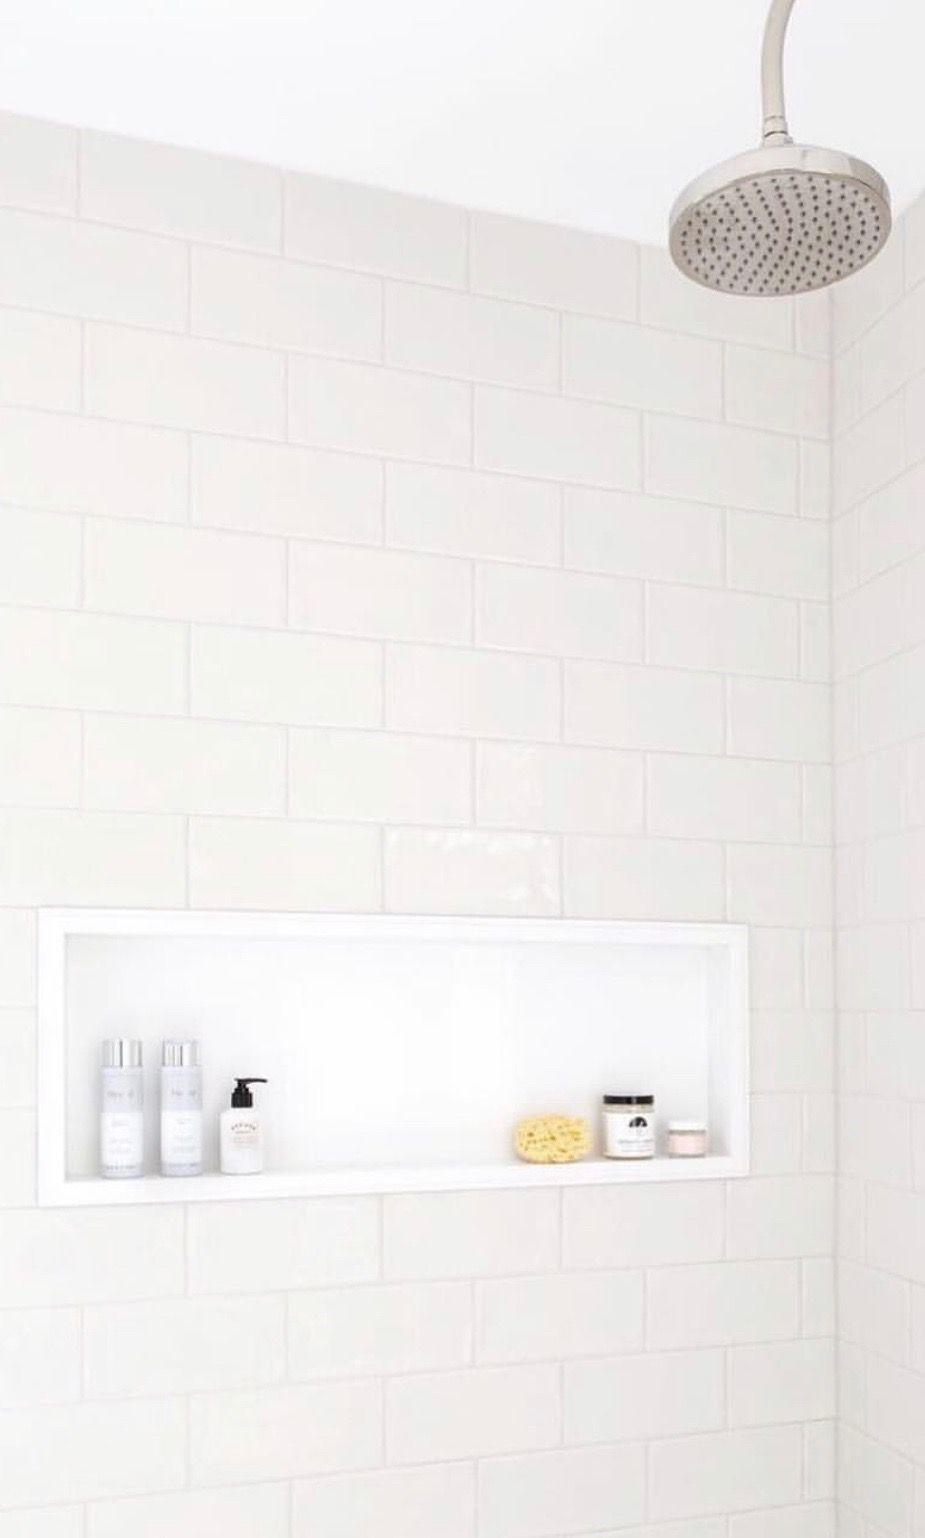 The Whole Shower Bathroom Styling Minimalist Skincare Organic Body Care